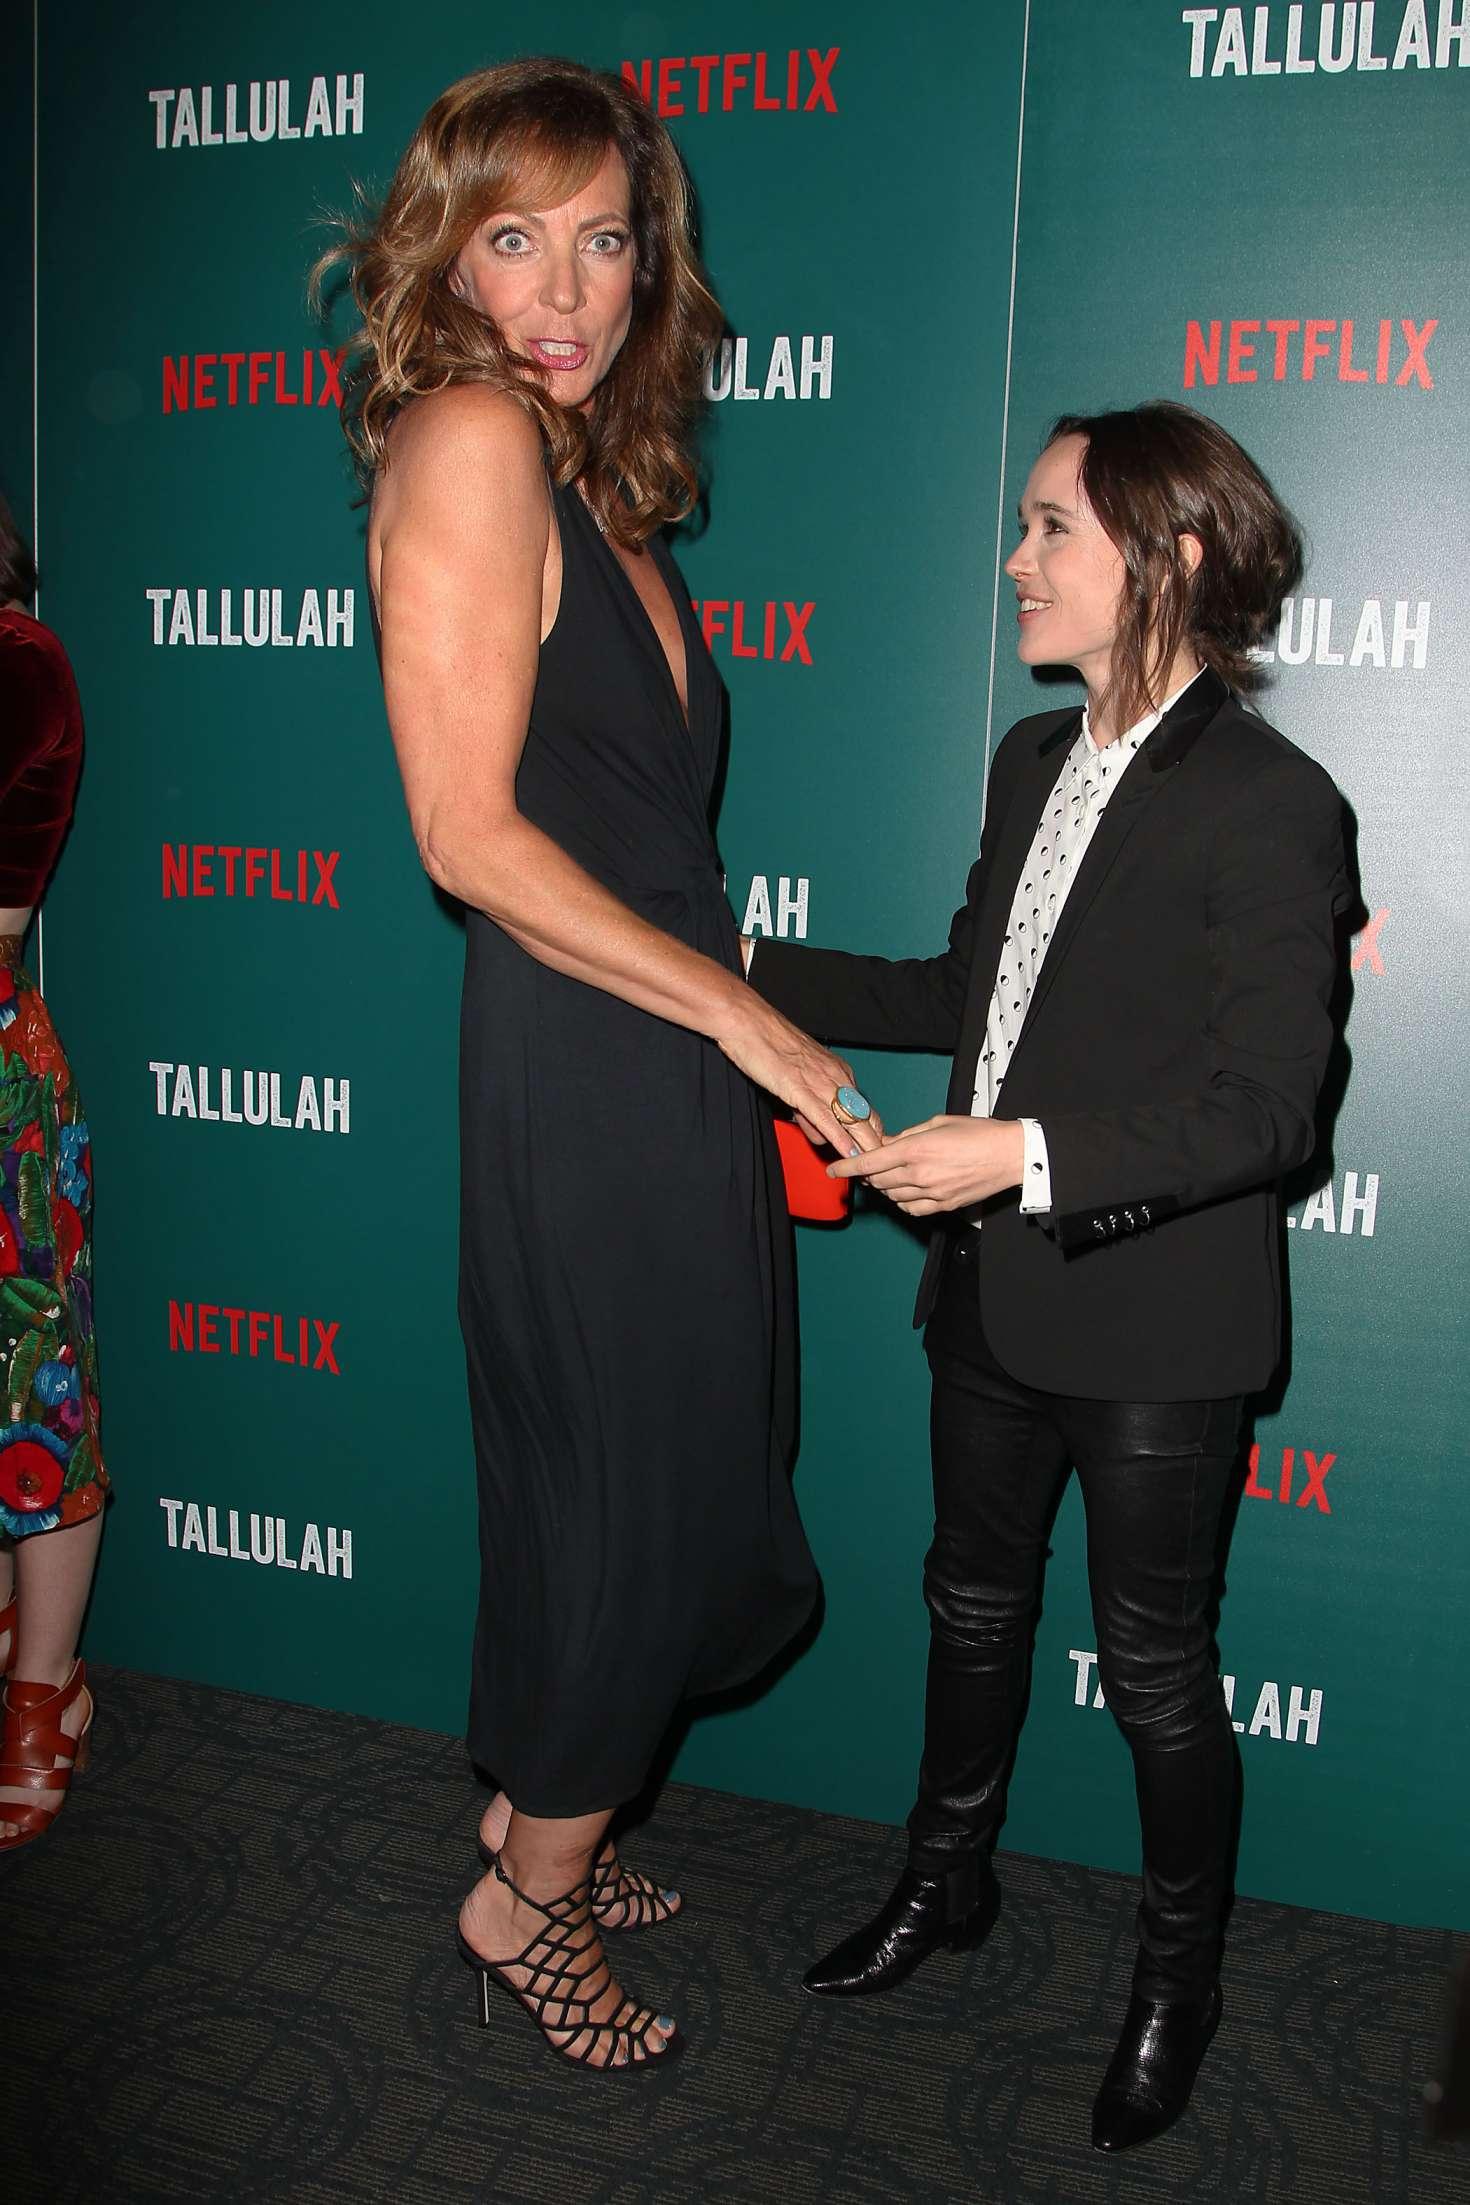 Allison Janney Tallulah NY Screening 03  GotCeleb